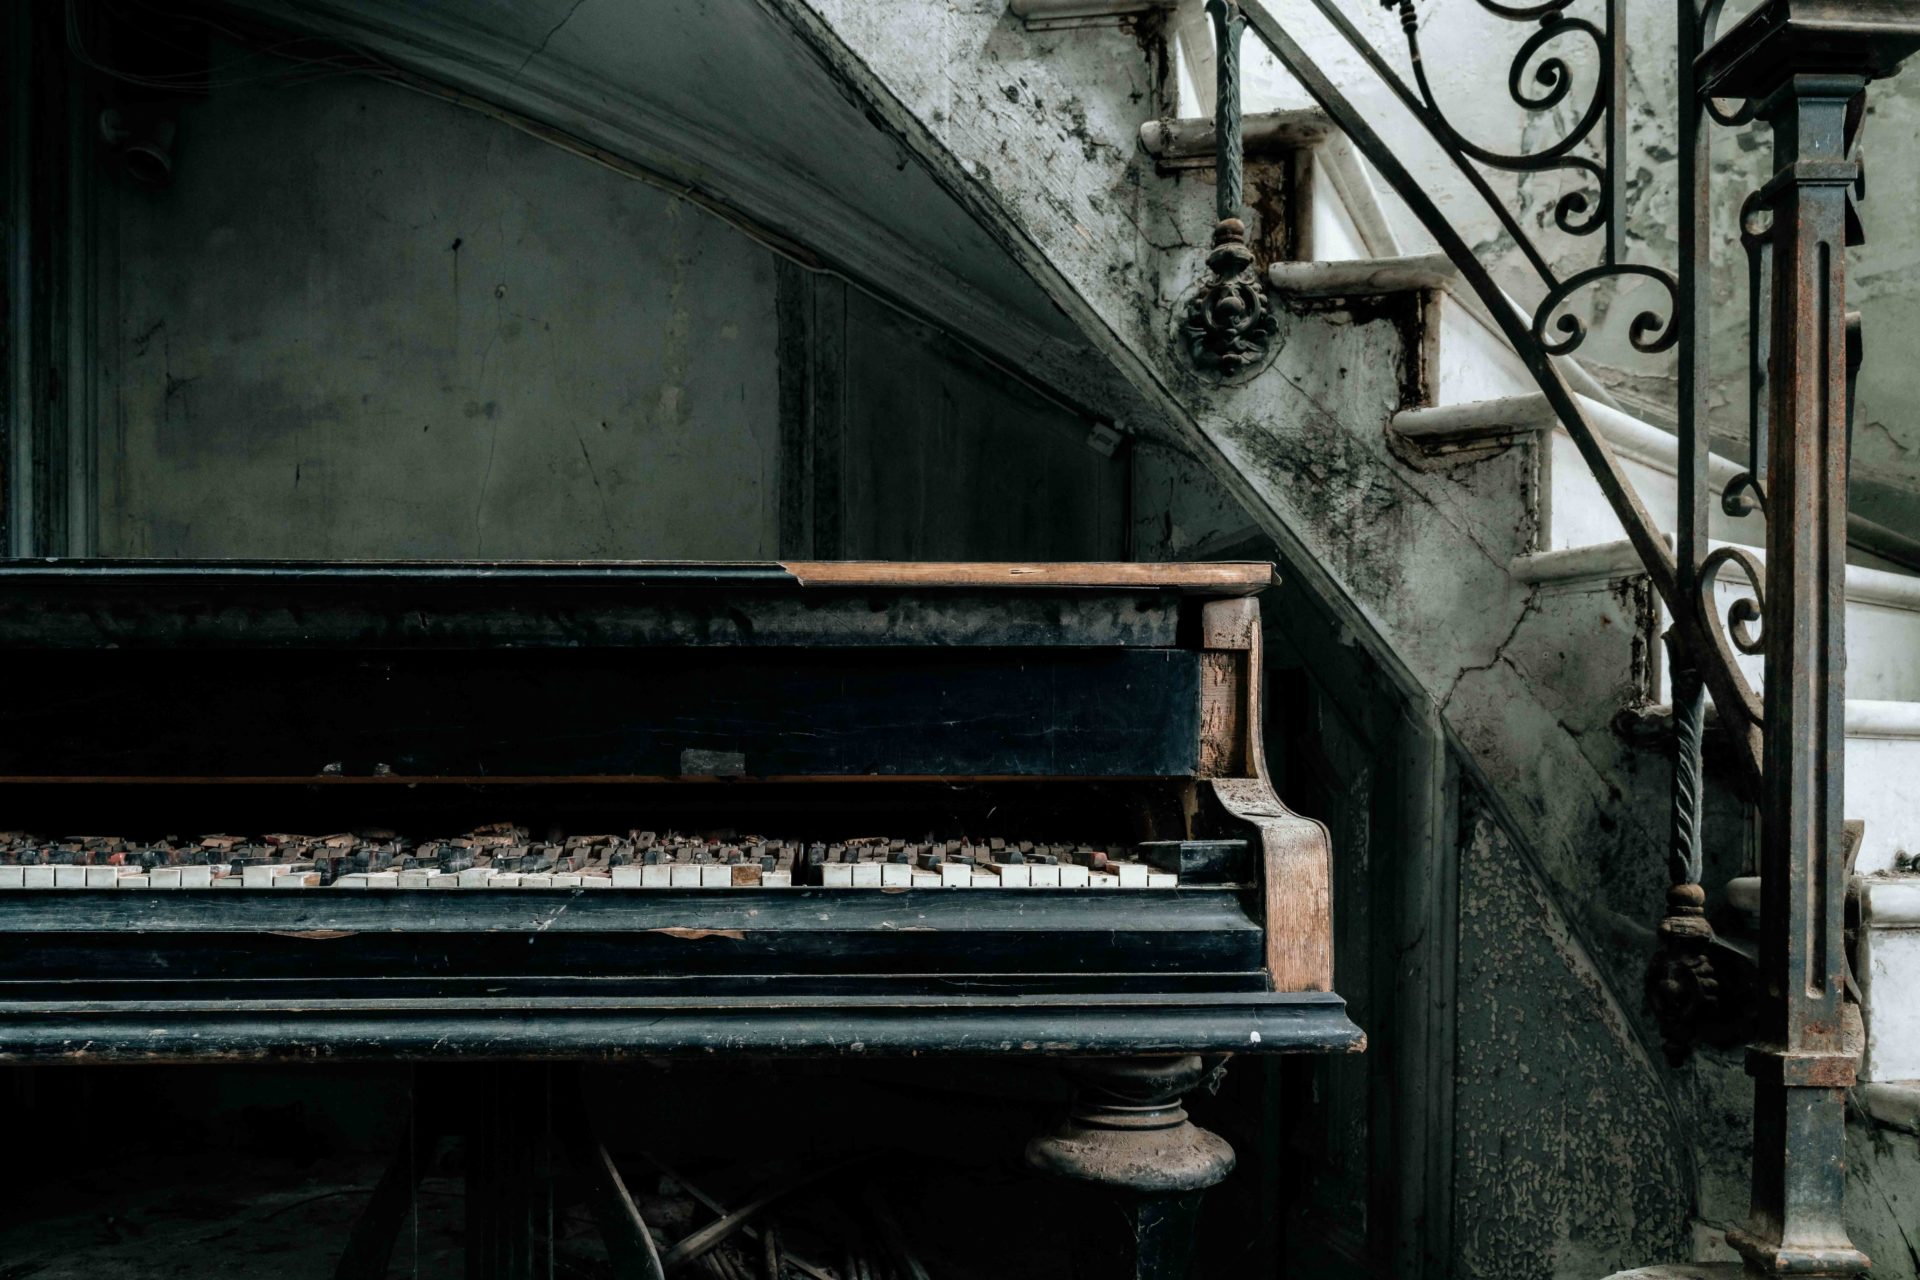 Requiem pour pianos 86 | Serie Requiem pour pianos | Romain Thiery | France